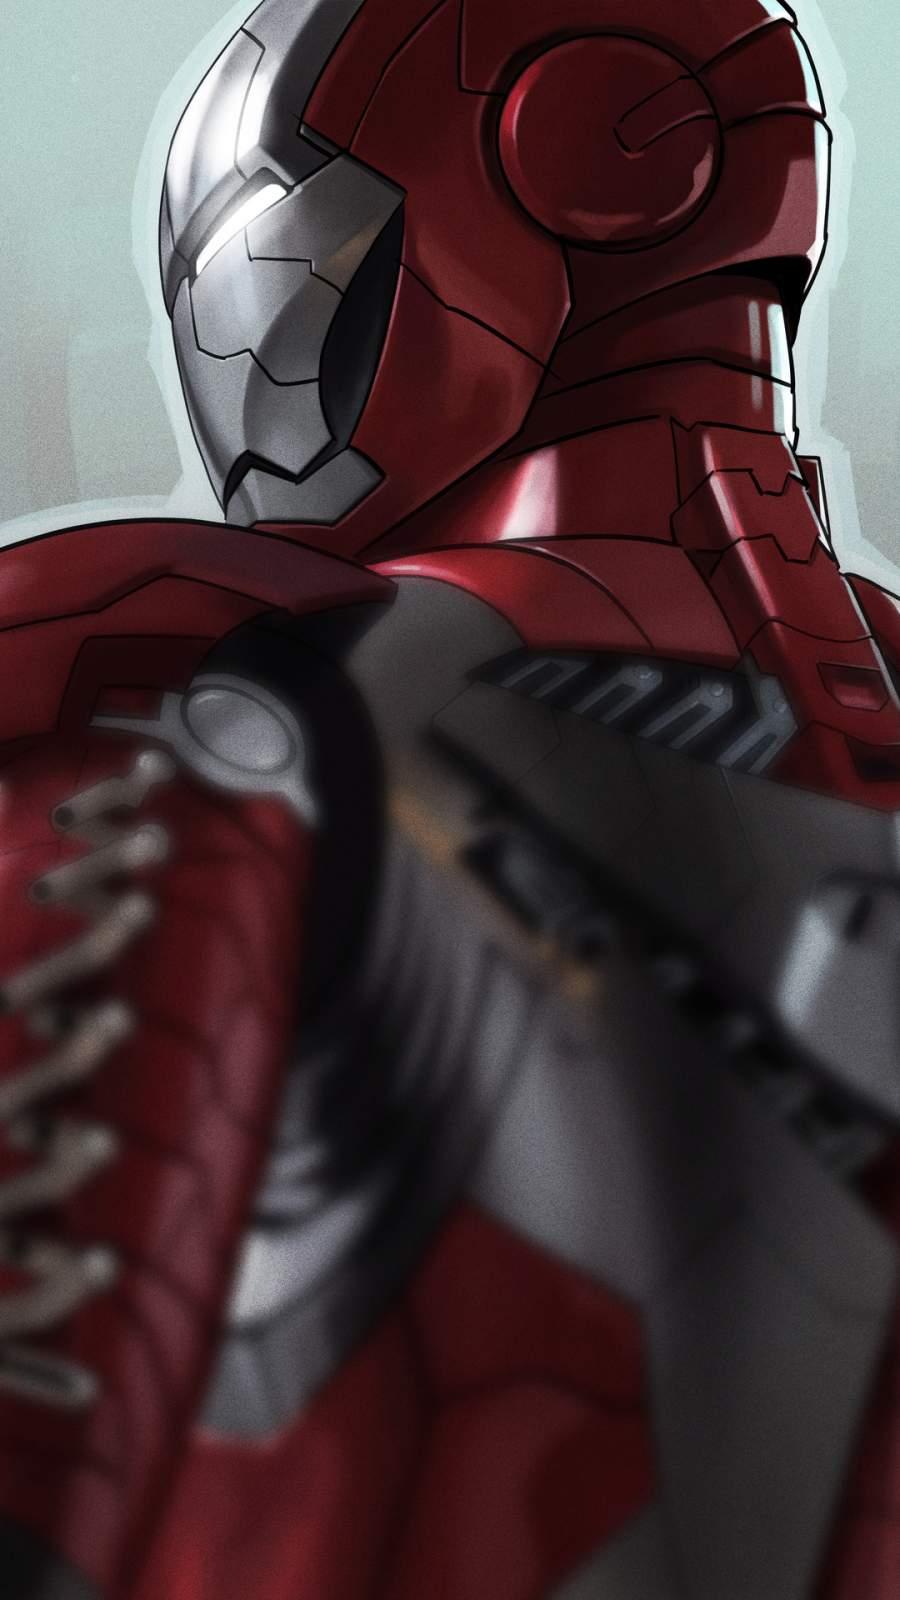 Iron Man Armor iPhone Wallpaper